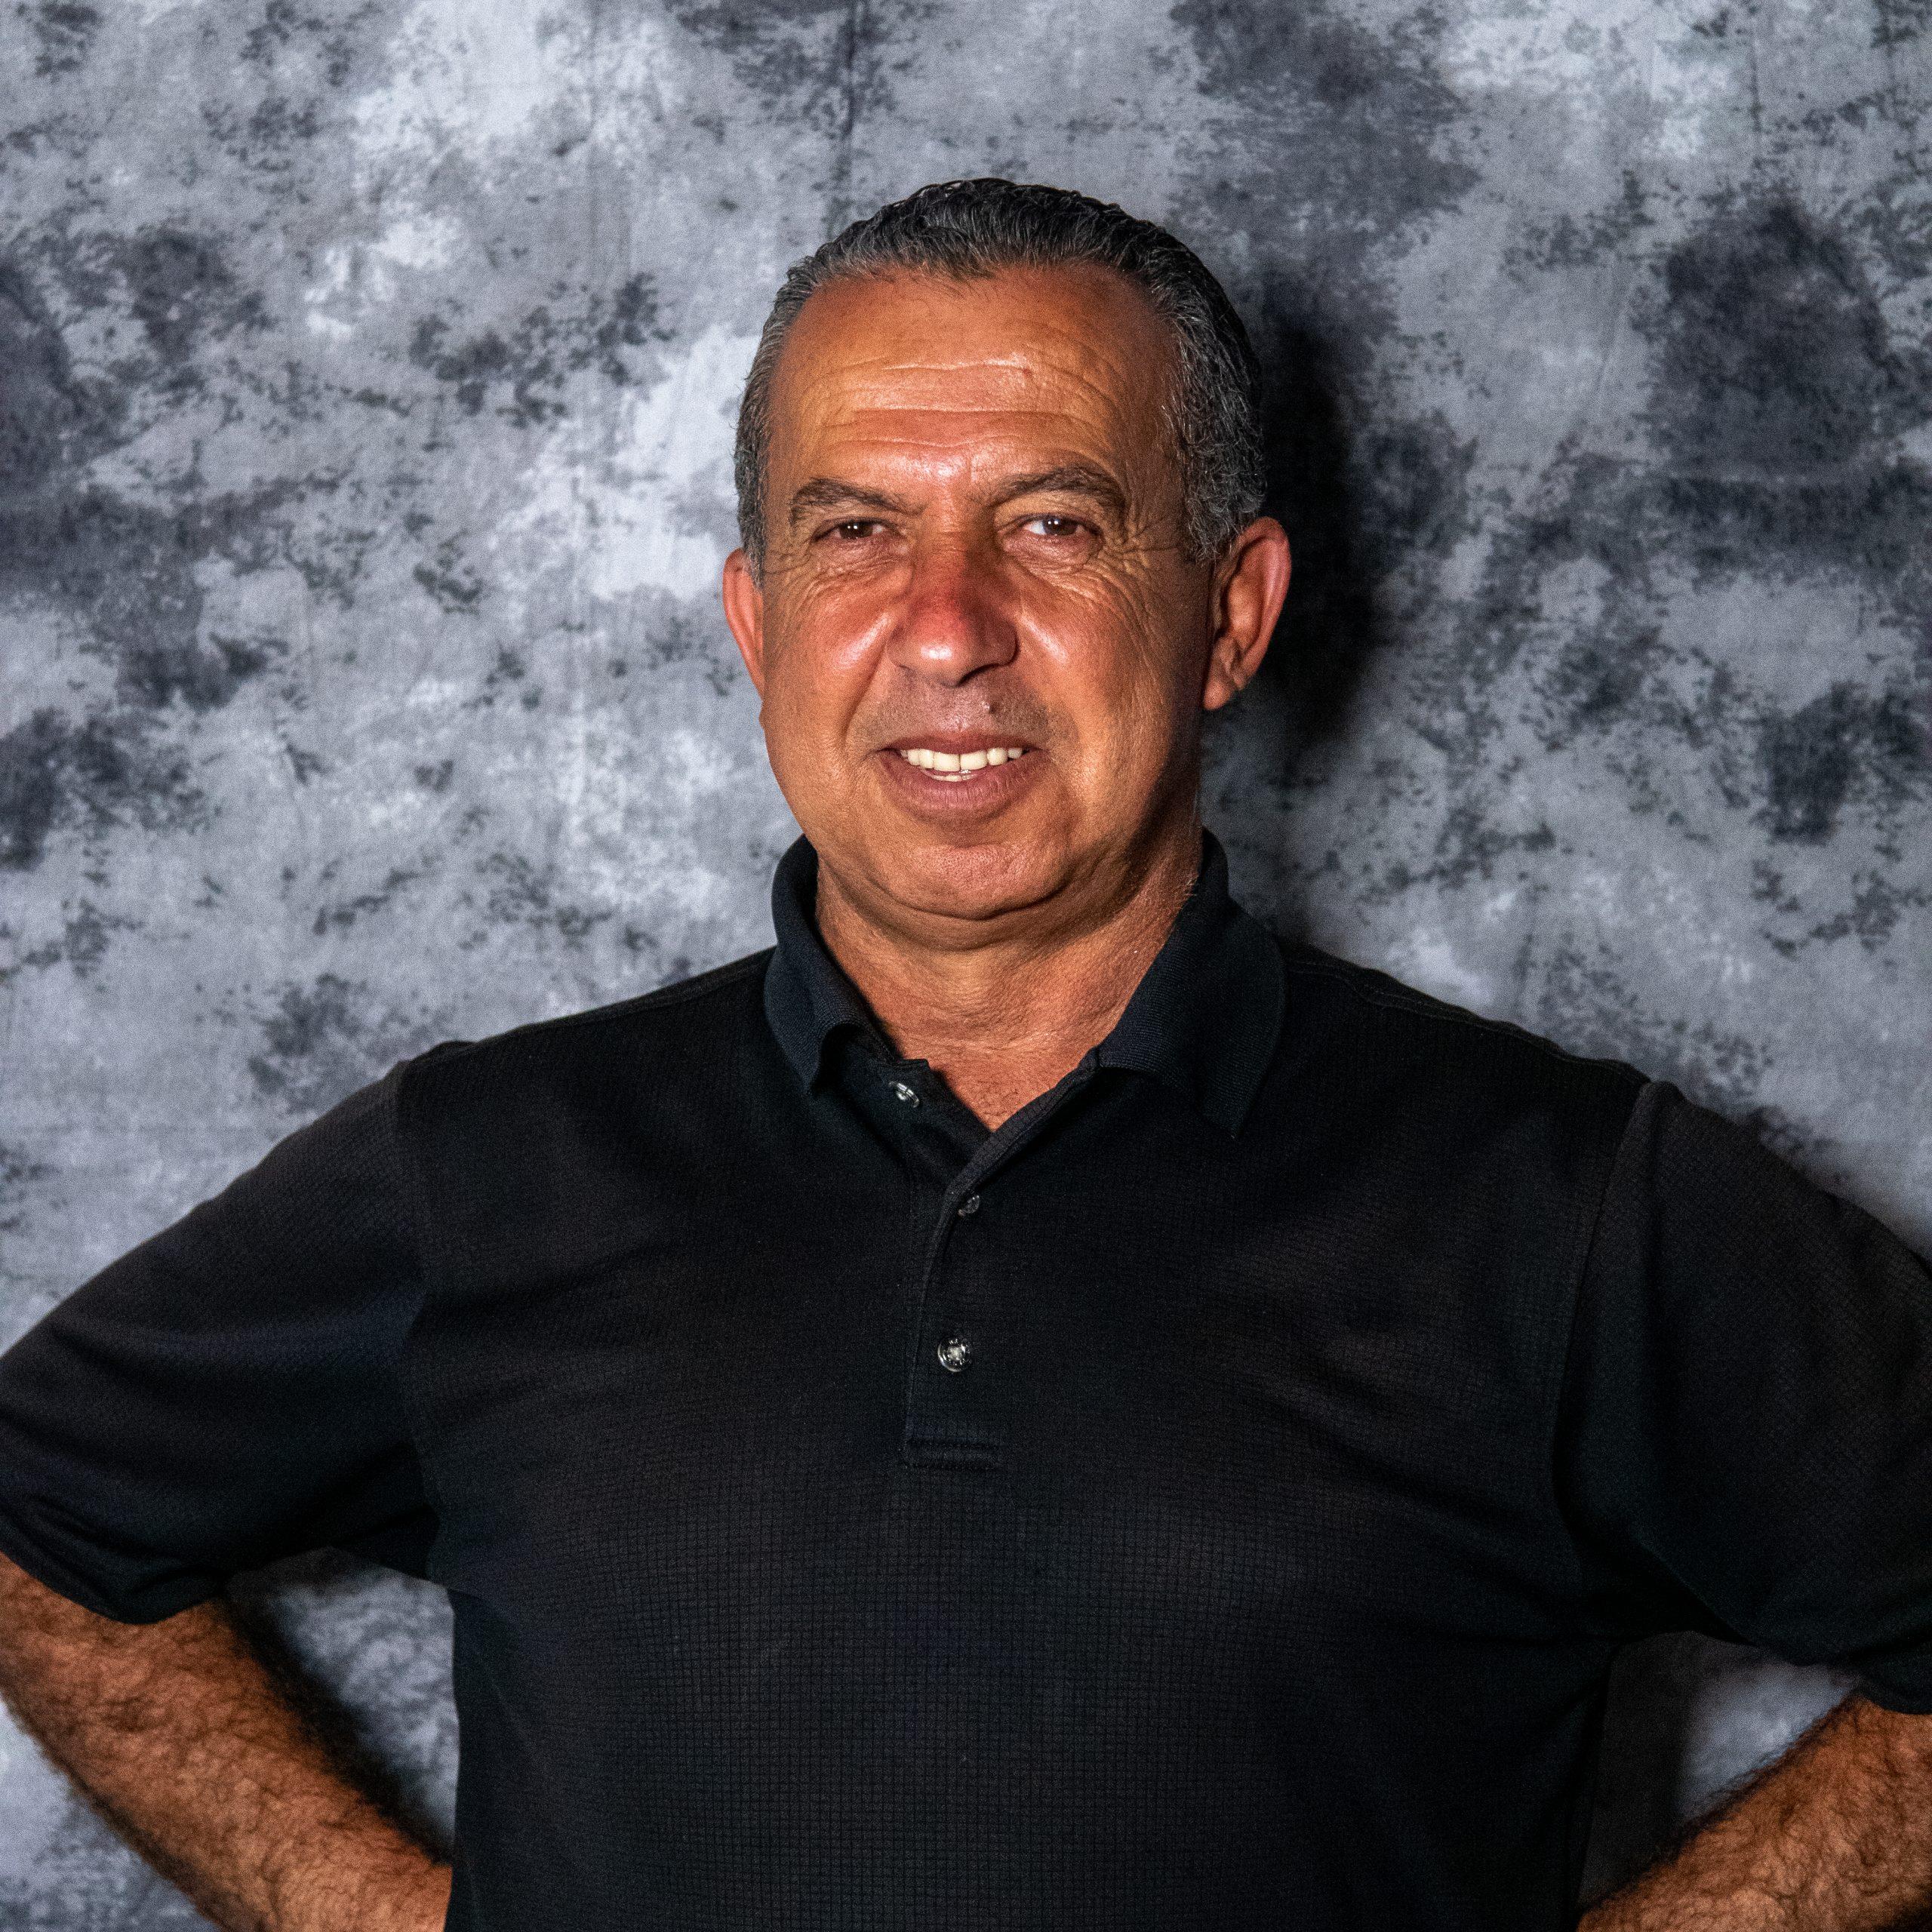 Rafat Abuzaid